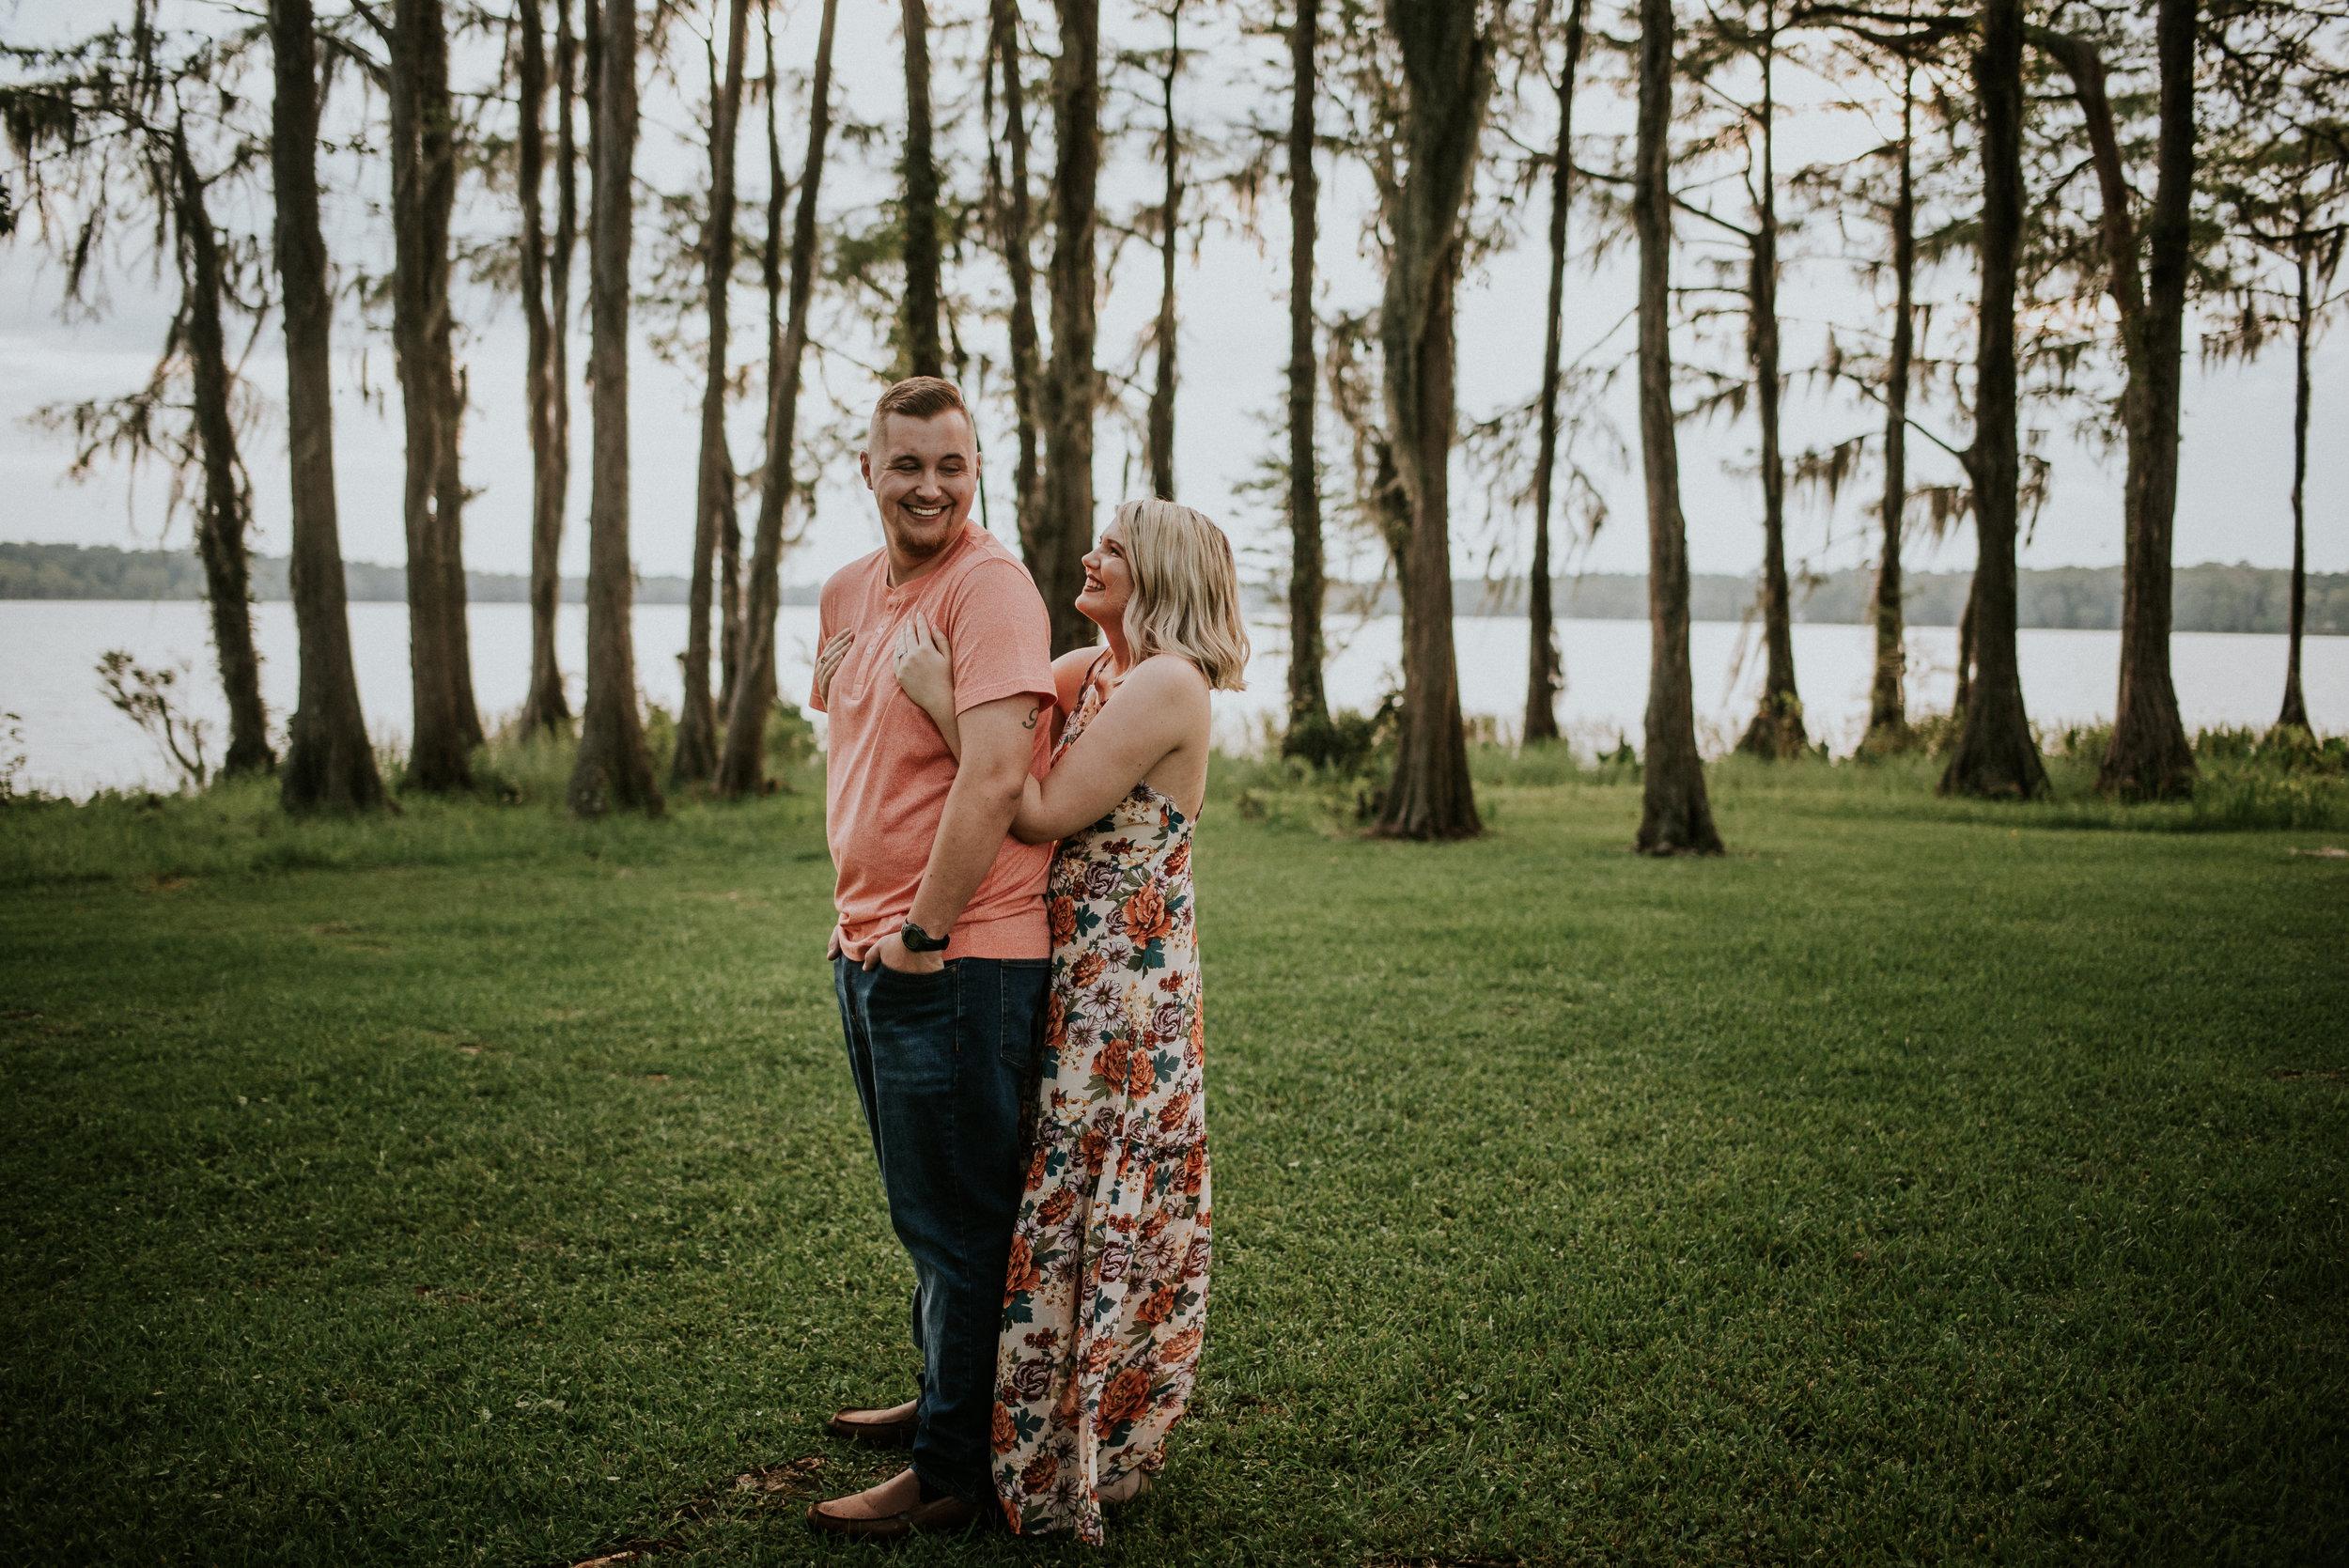 kimberly-trey-crestview-florida-couples-photographer-17.jpg